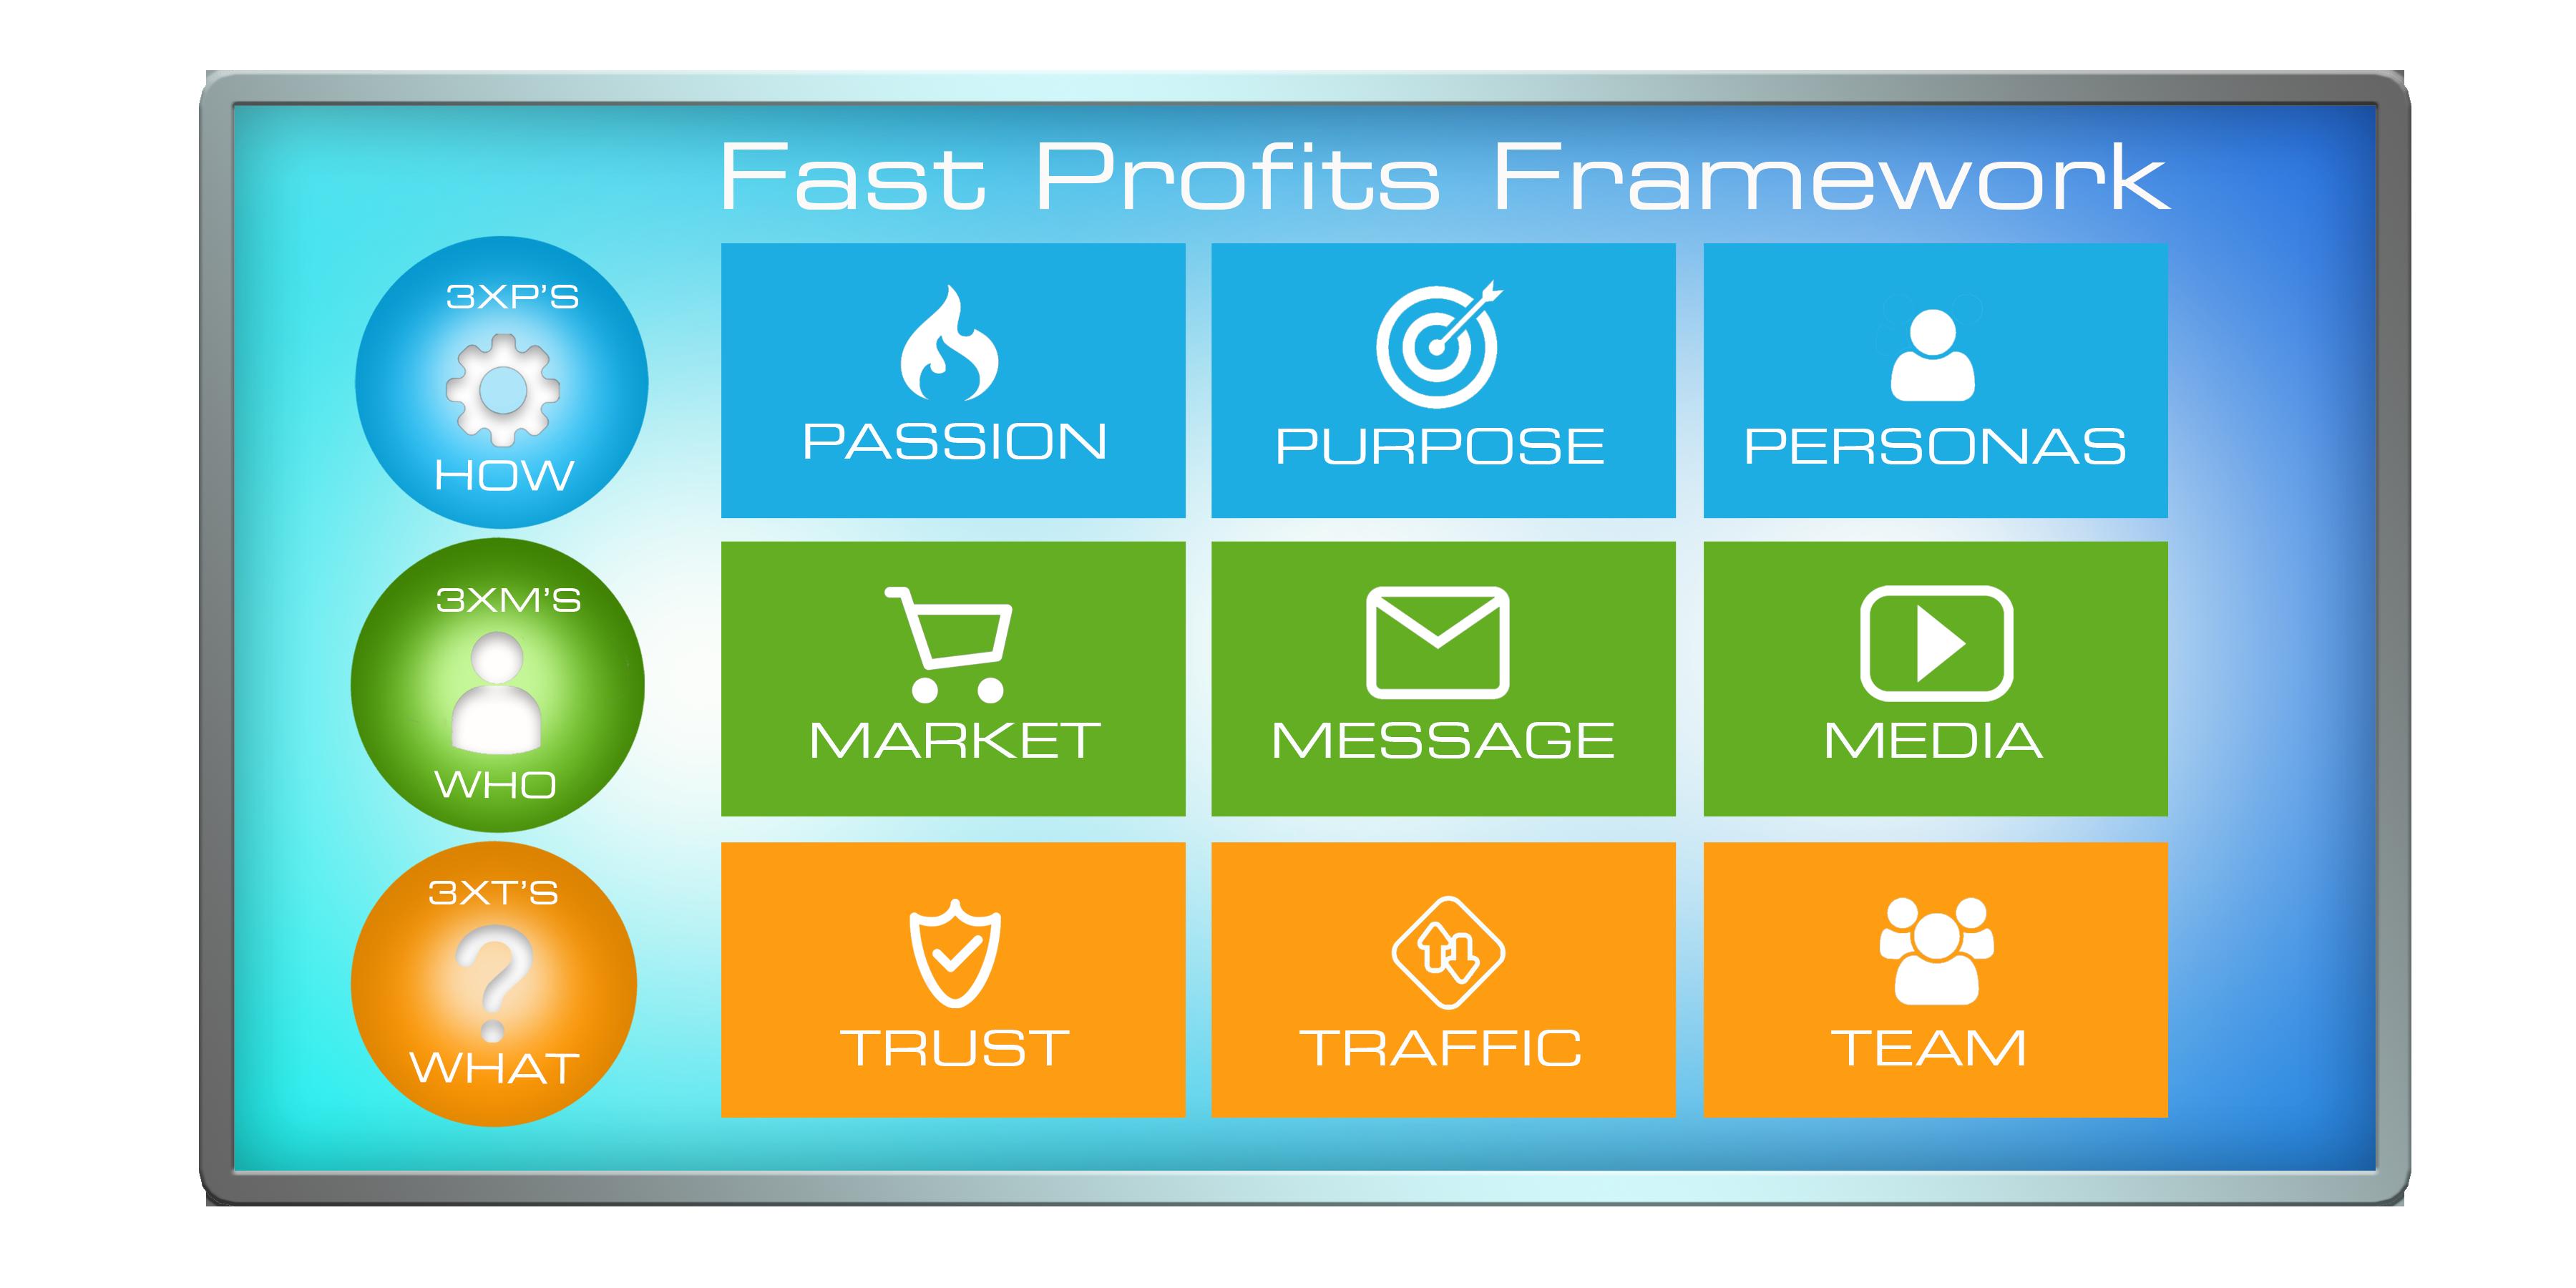 FAST PROFITS FRAMEWORK